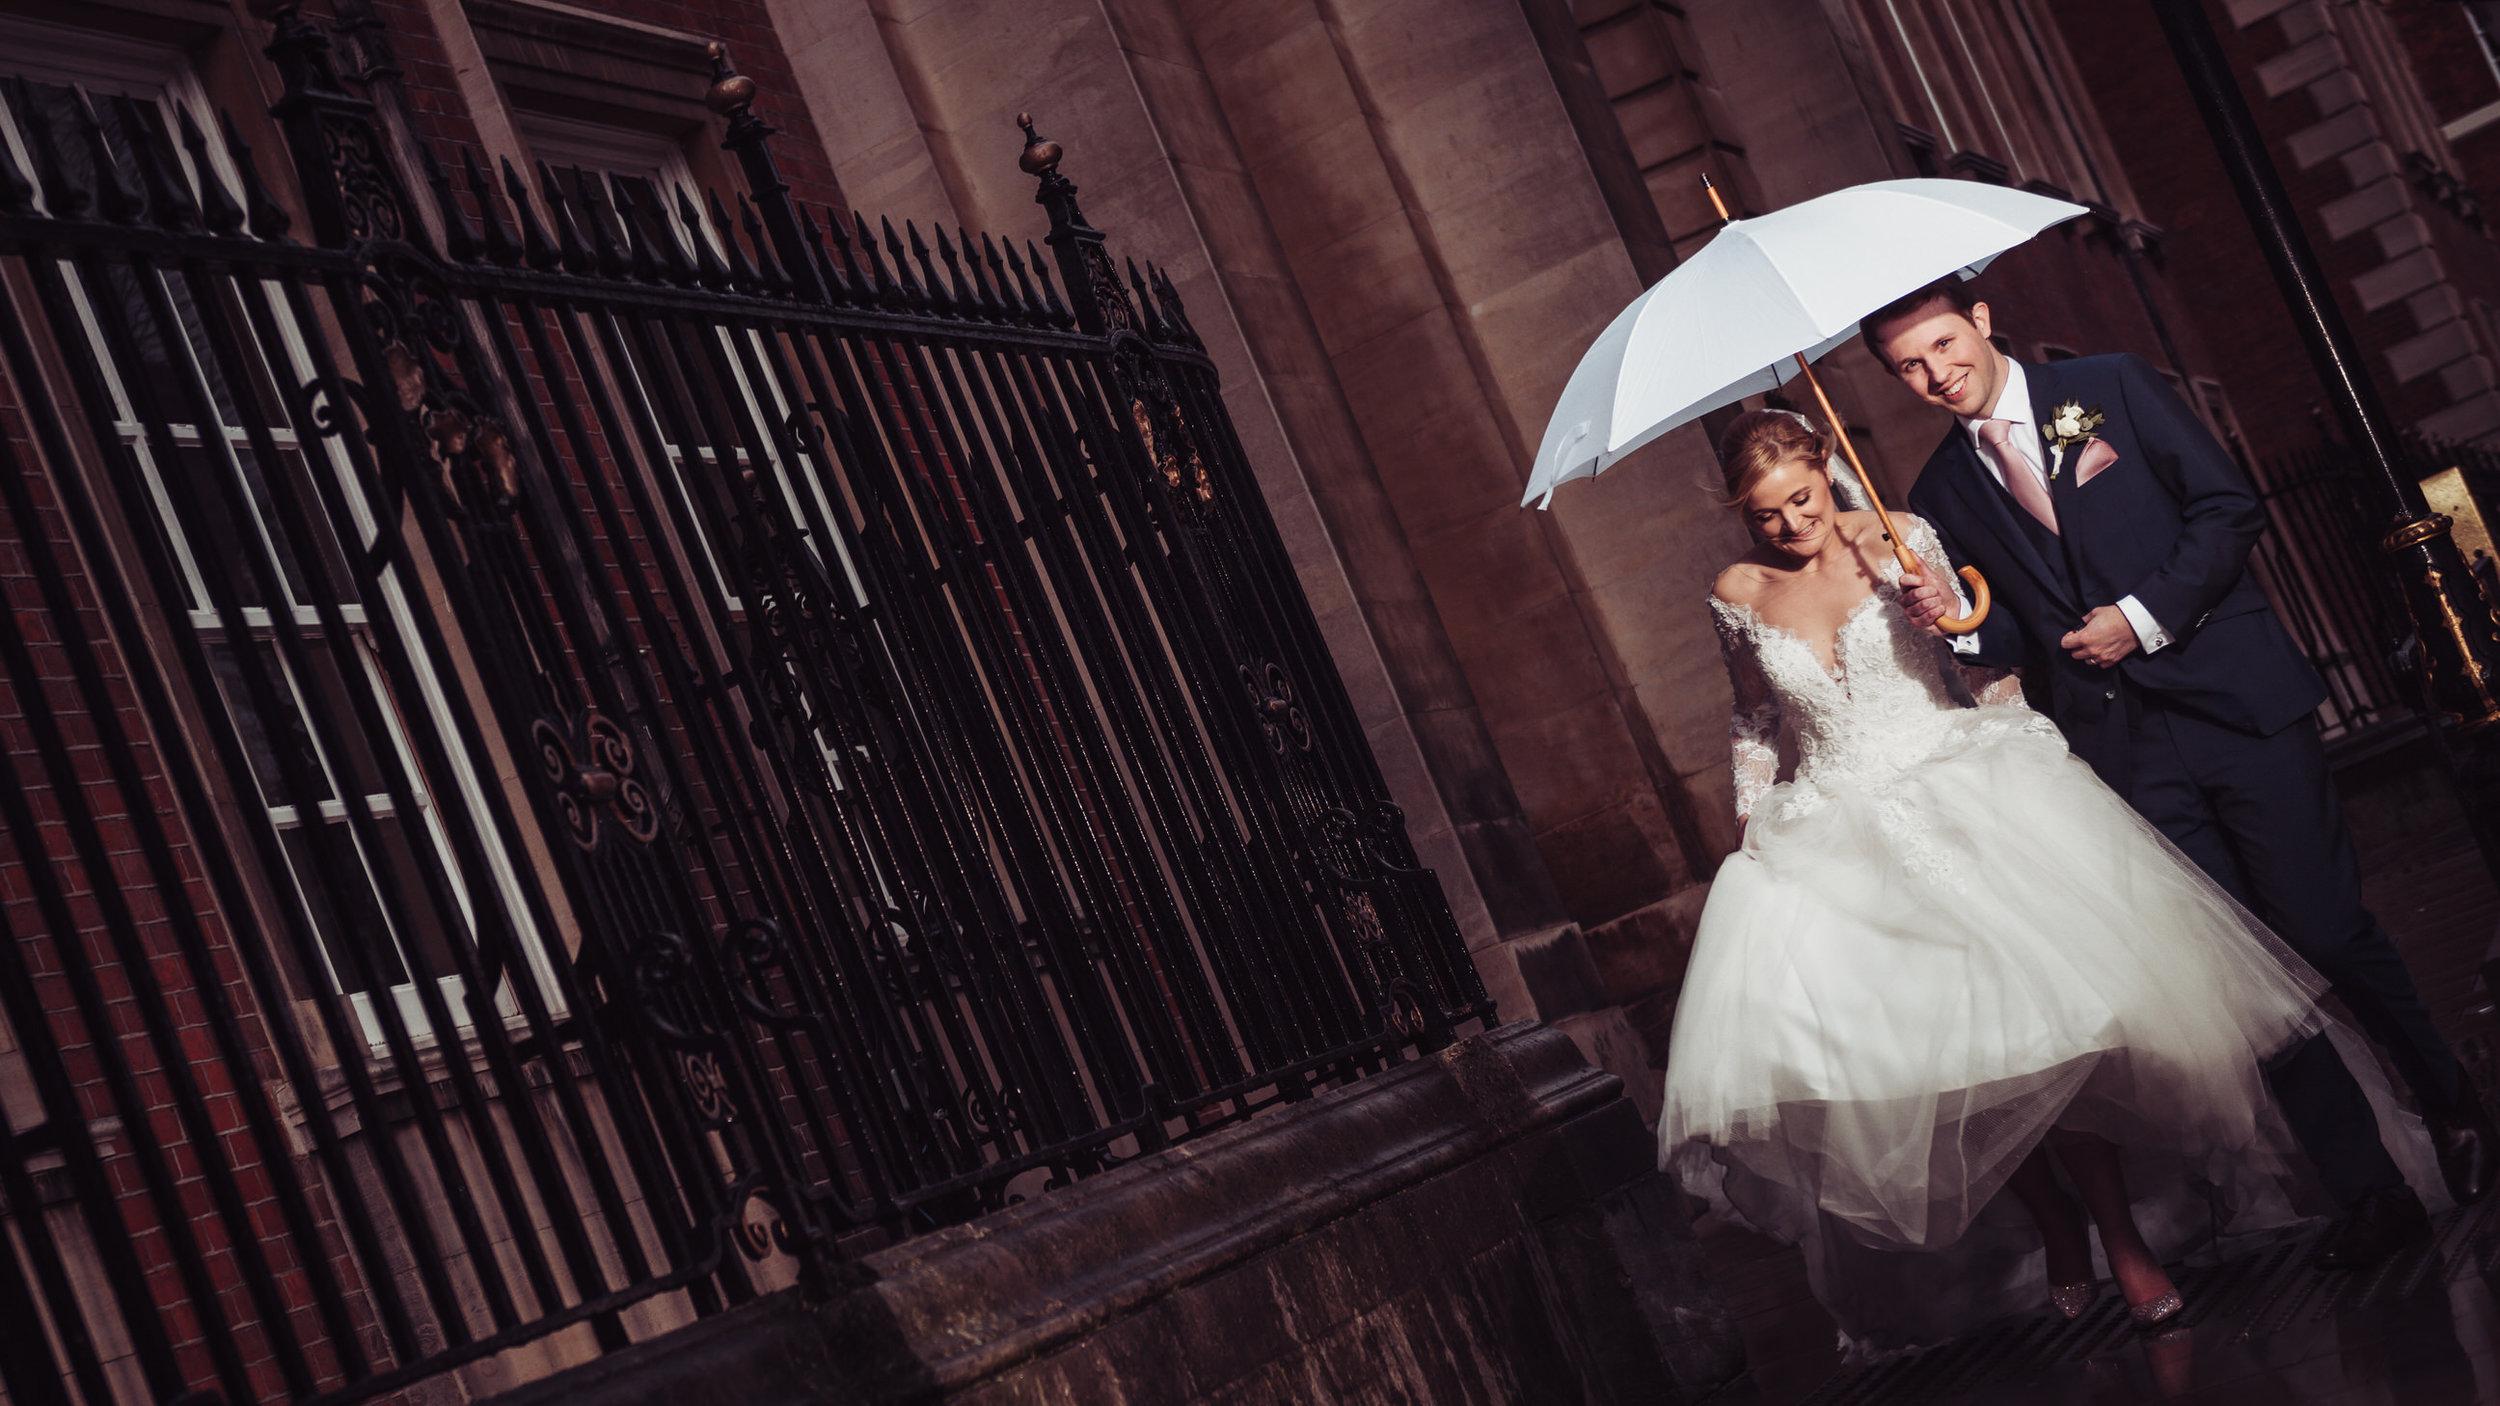 the-grand-hotel-york-wedding-photographer-46.jpg